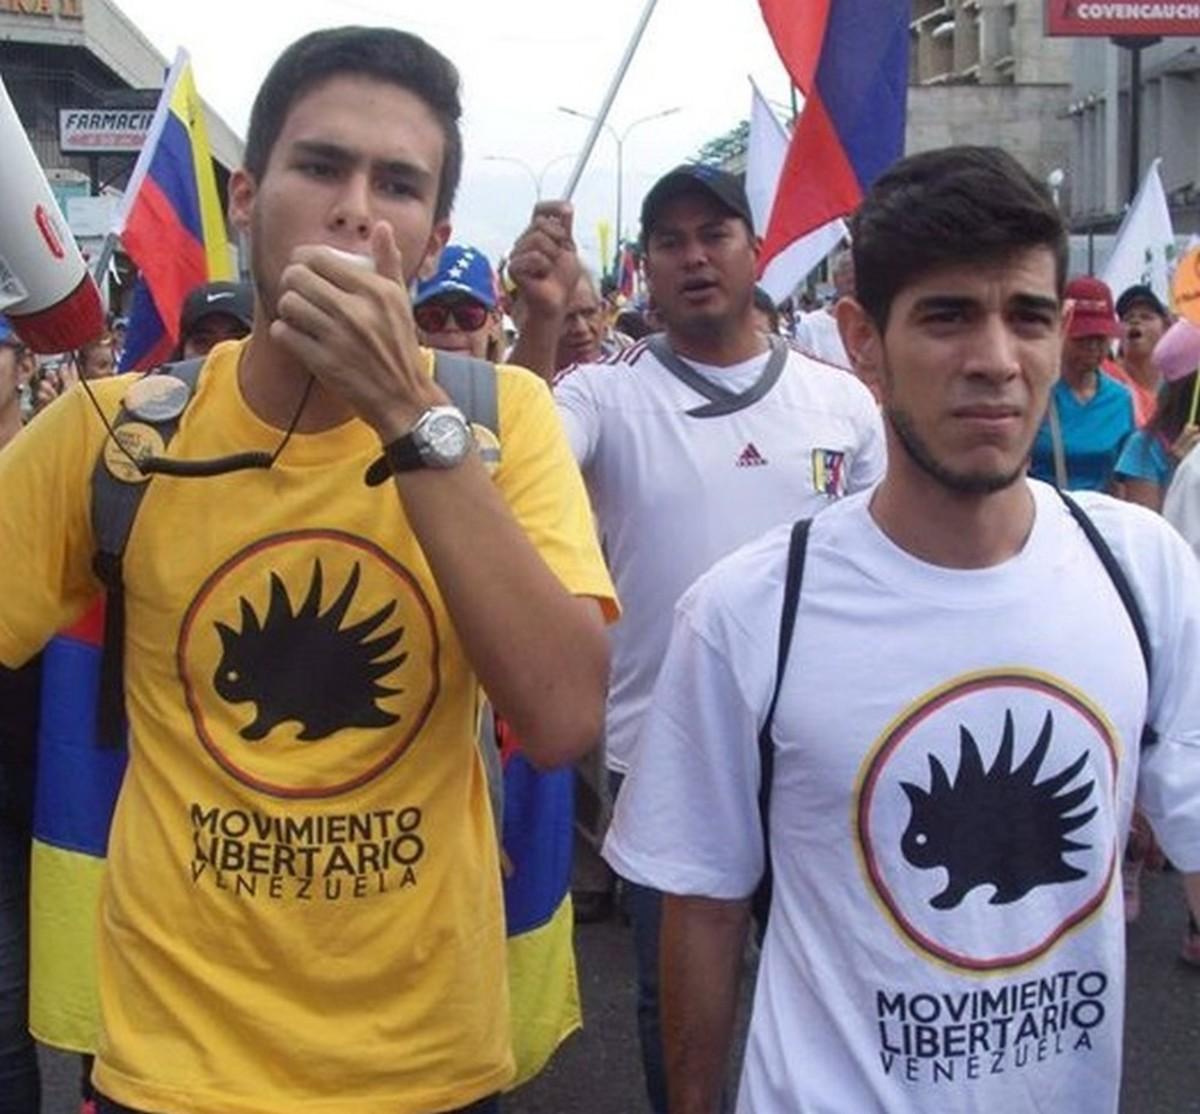 In June members of Movimiento Libertario de Venezuela took to the streets in defiance of their violent, dictatorial socialist regime.